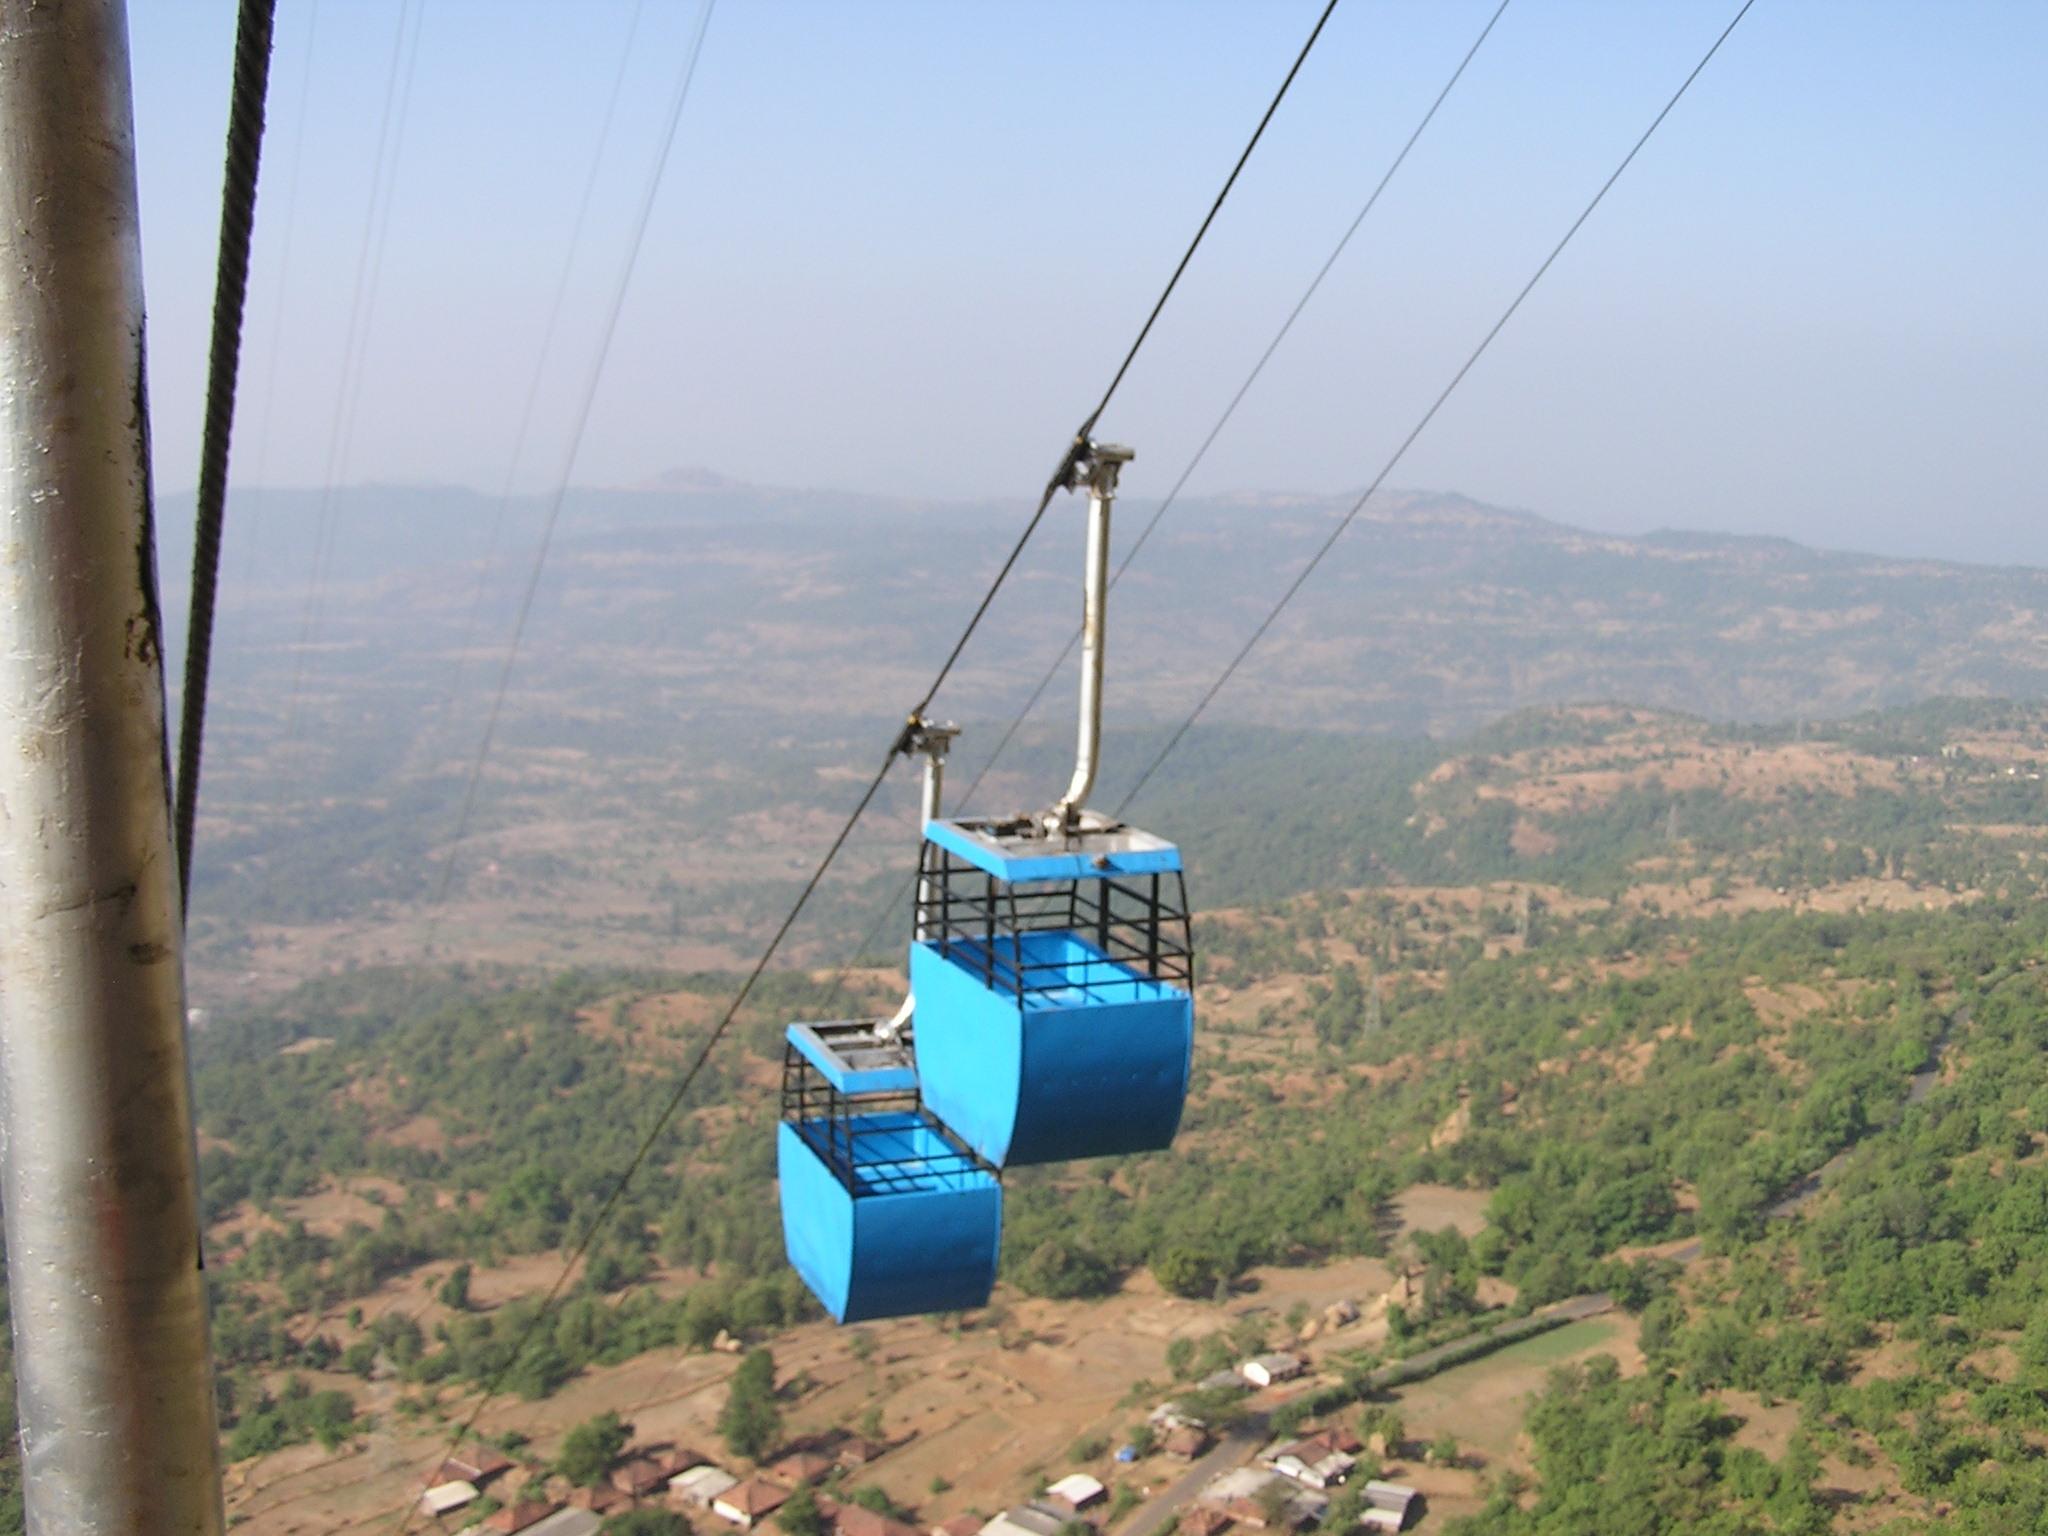 File:Raigad ropeway.JPG - Wikimedia Commons